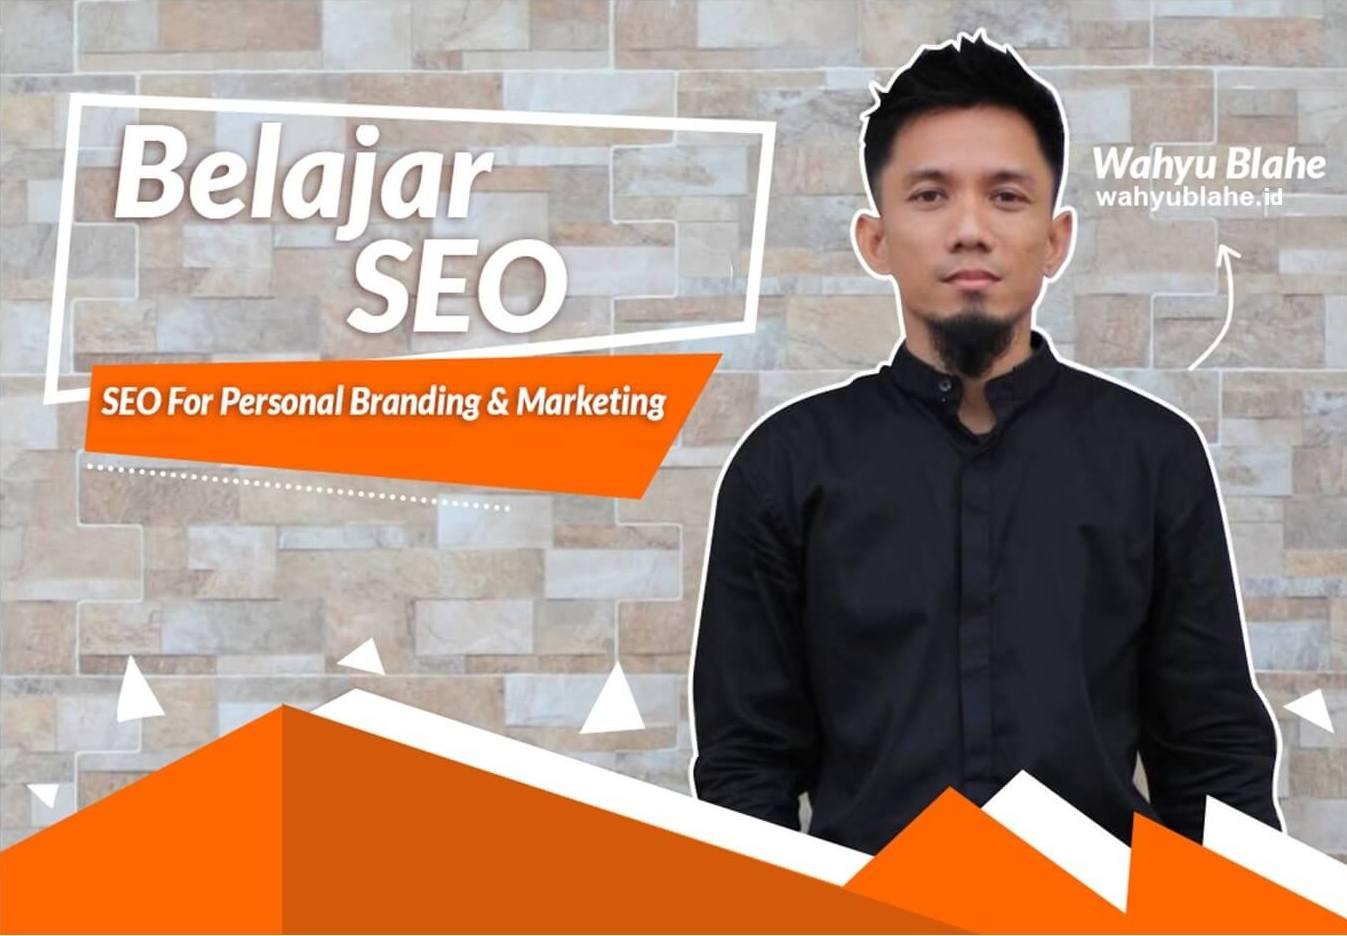 Belajar SEO Dari Guru Pakar Master Konsultan Ahli SEO Indonesia di Medan Wahyu Blahe - WA: 085261199133